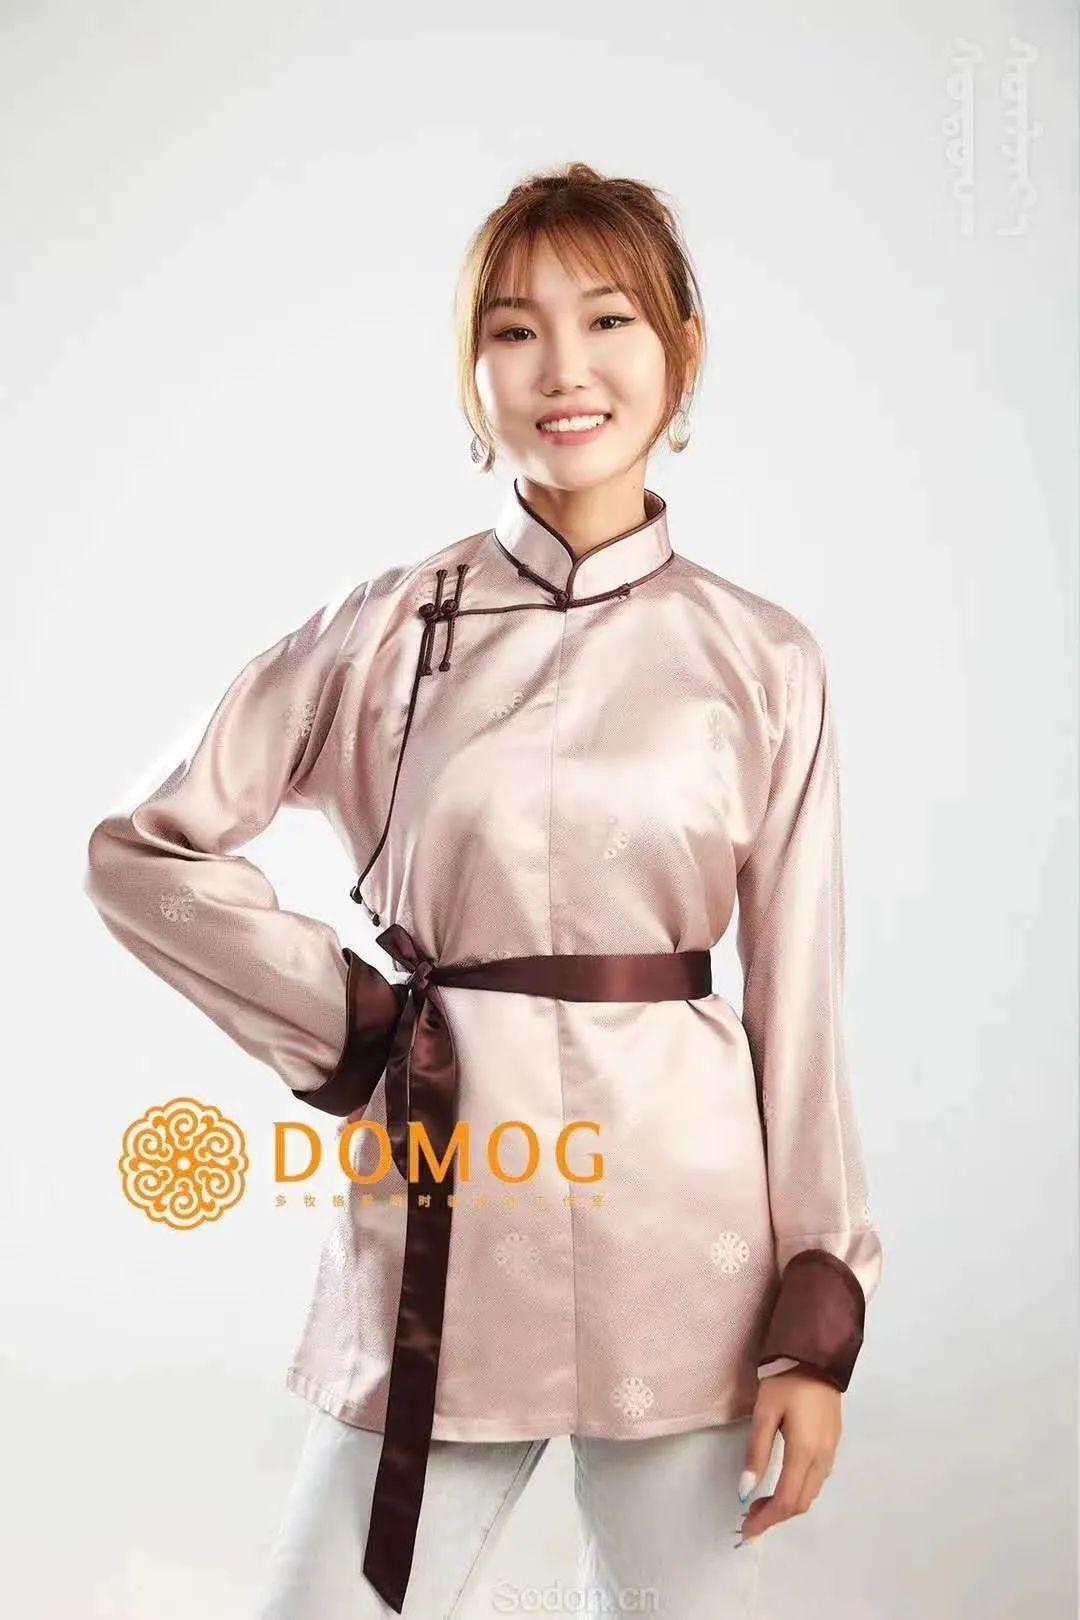 DOMOG 蒙古时装2020新款,民族与时尚的融合 第37张 DOMOG 蒙古时装2020新款,民族与时尚的融合 蒙古服饰